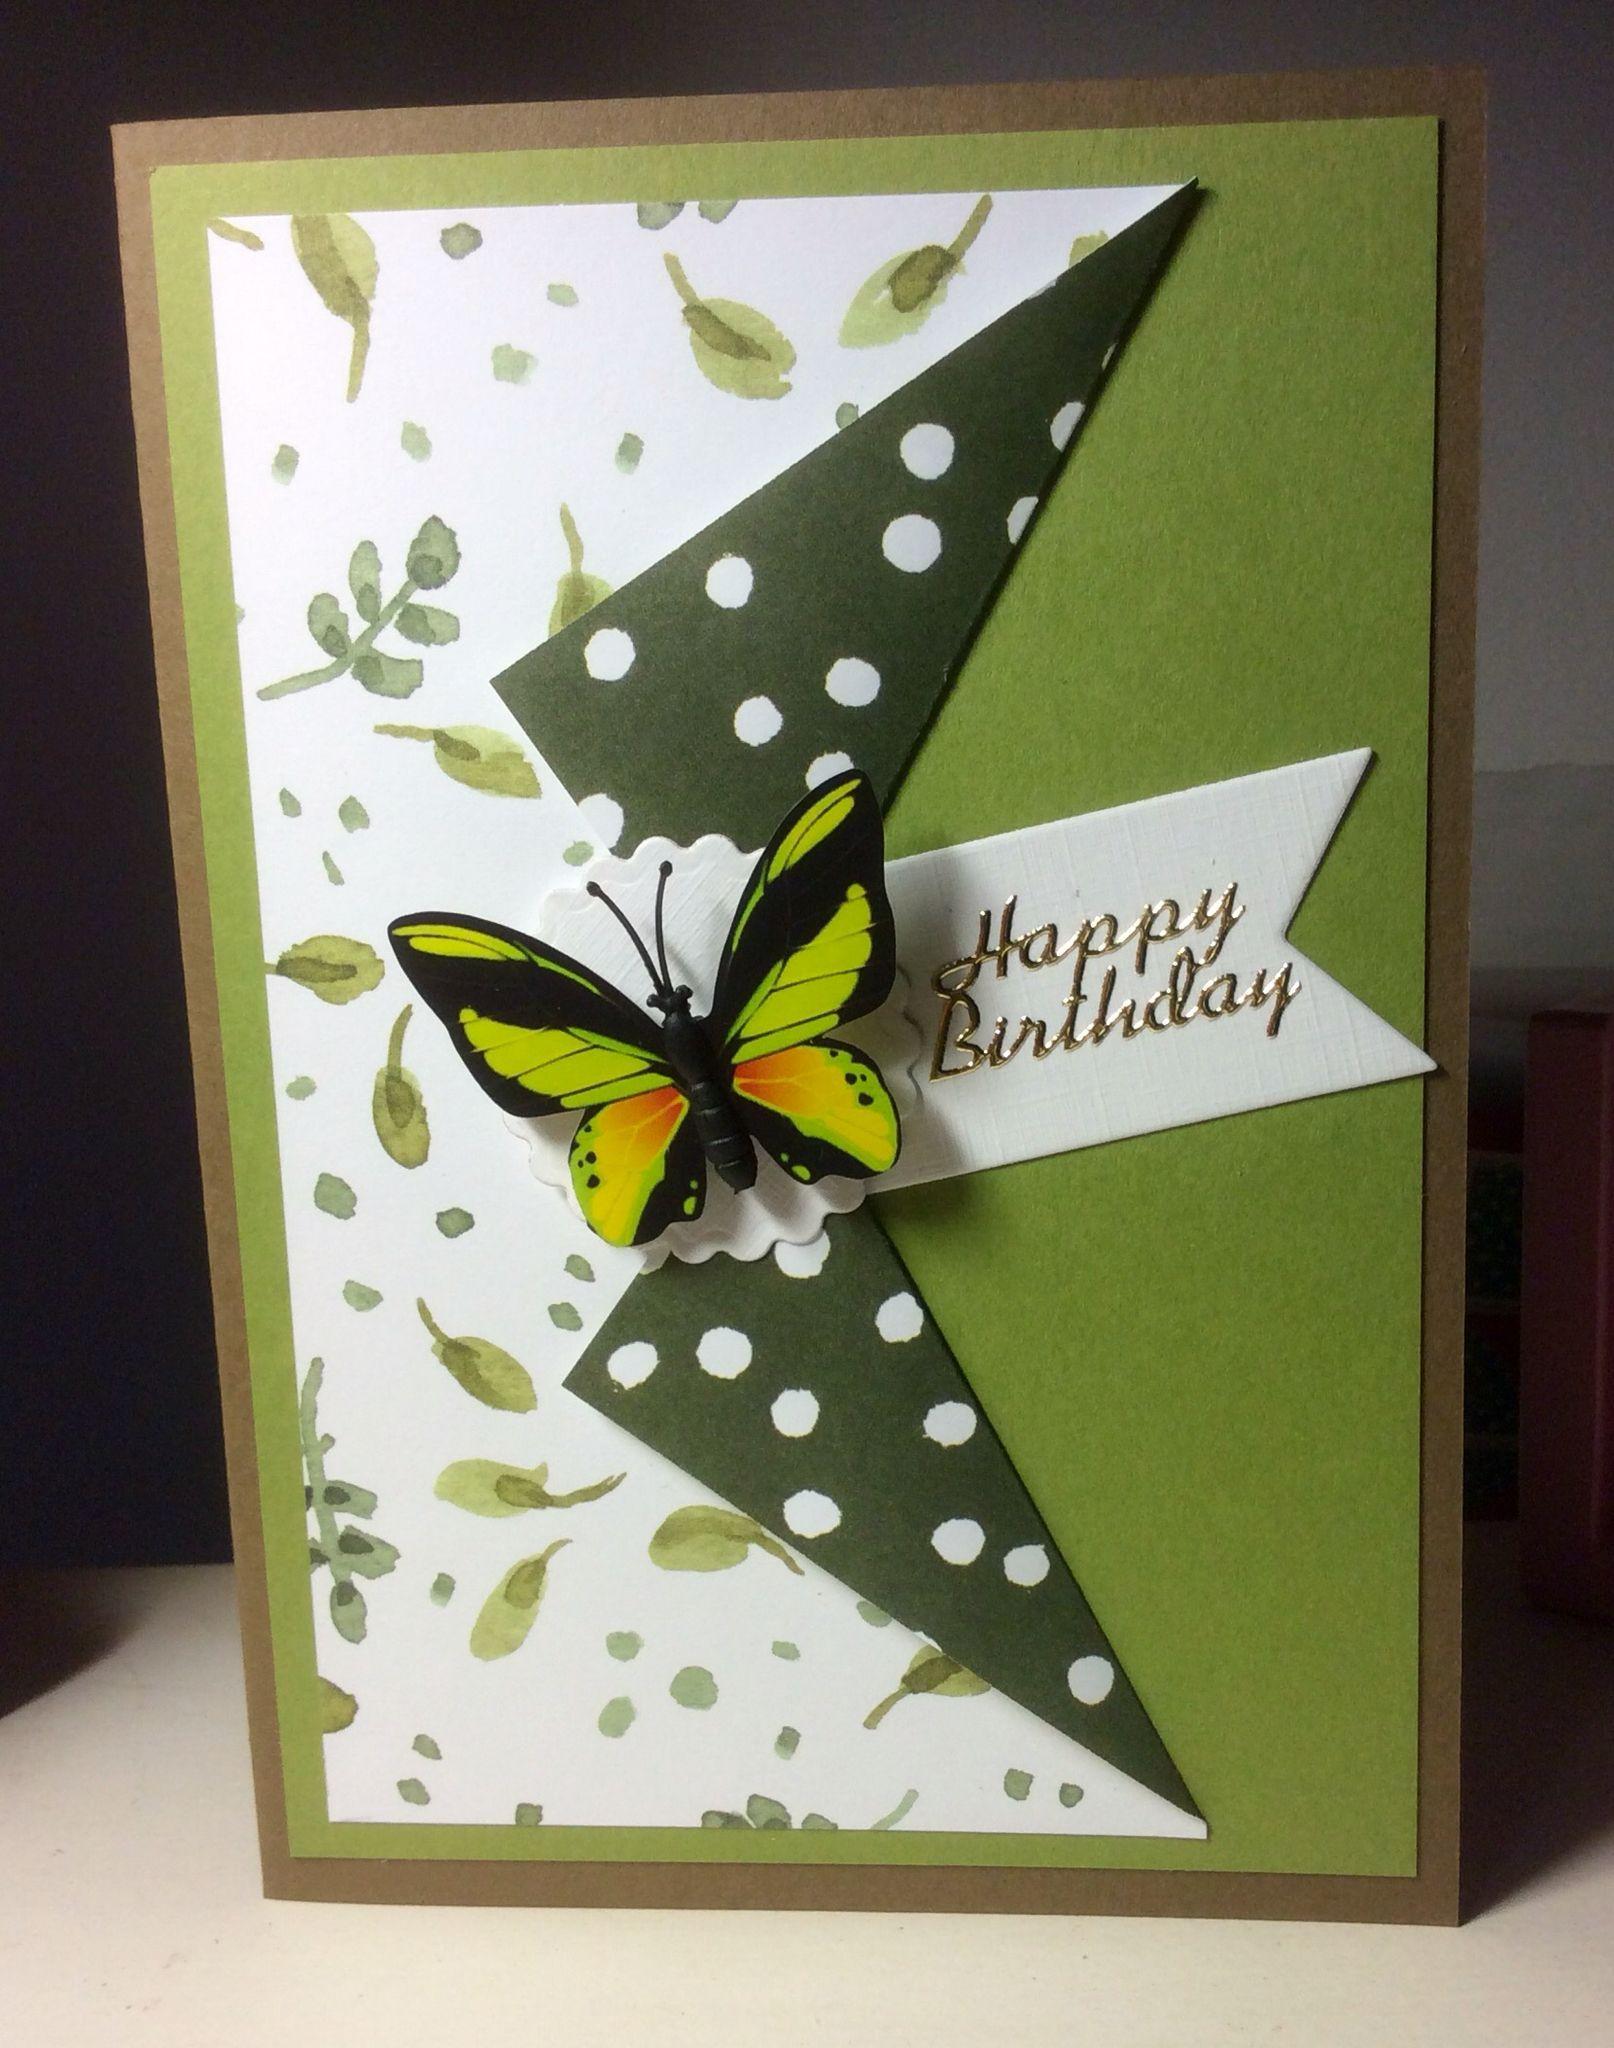 Pin By Jolanta Zuga On Handmade Pinterest Cards Birthday Cards